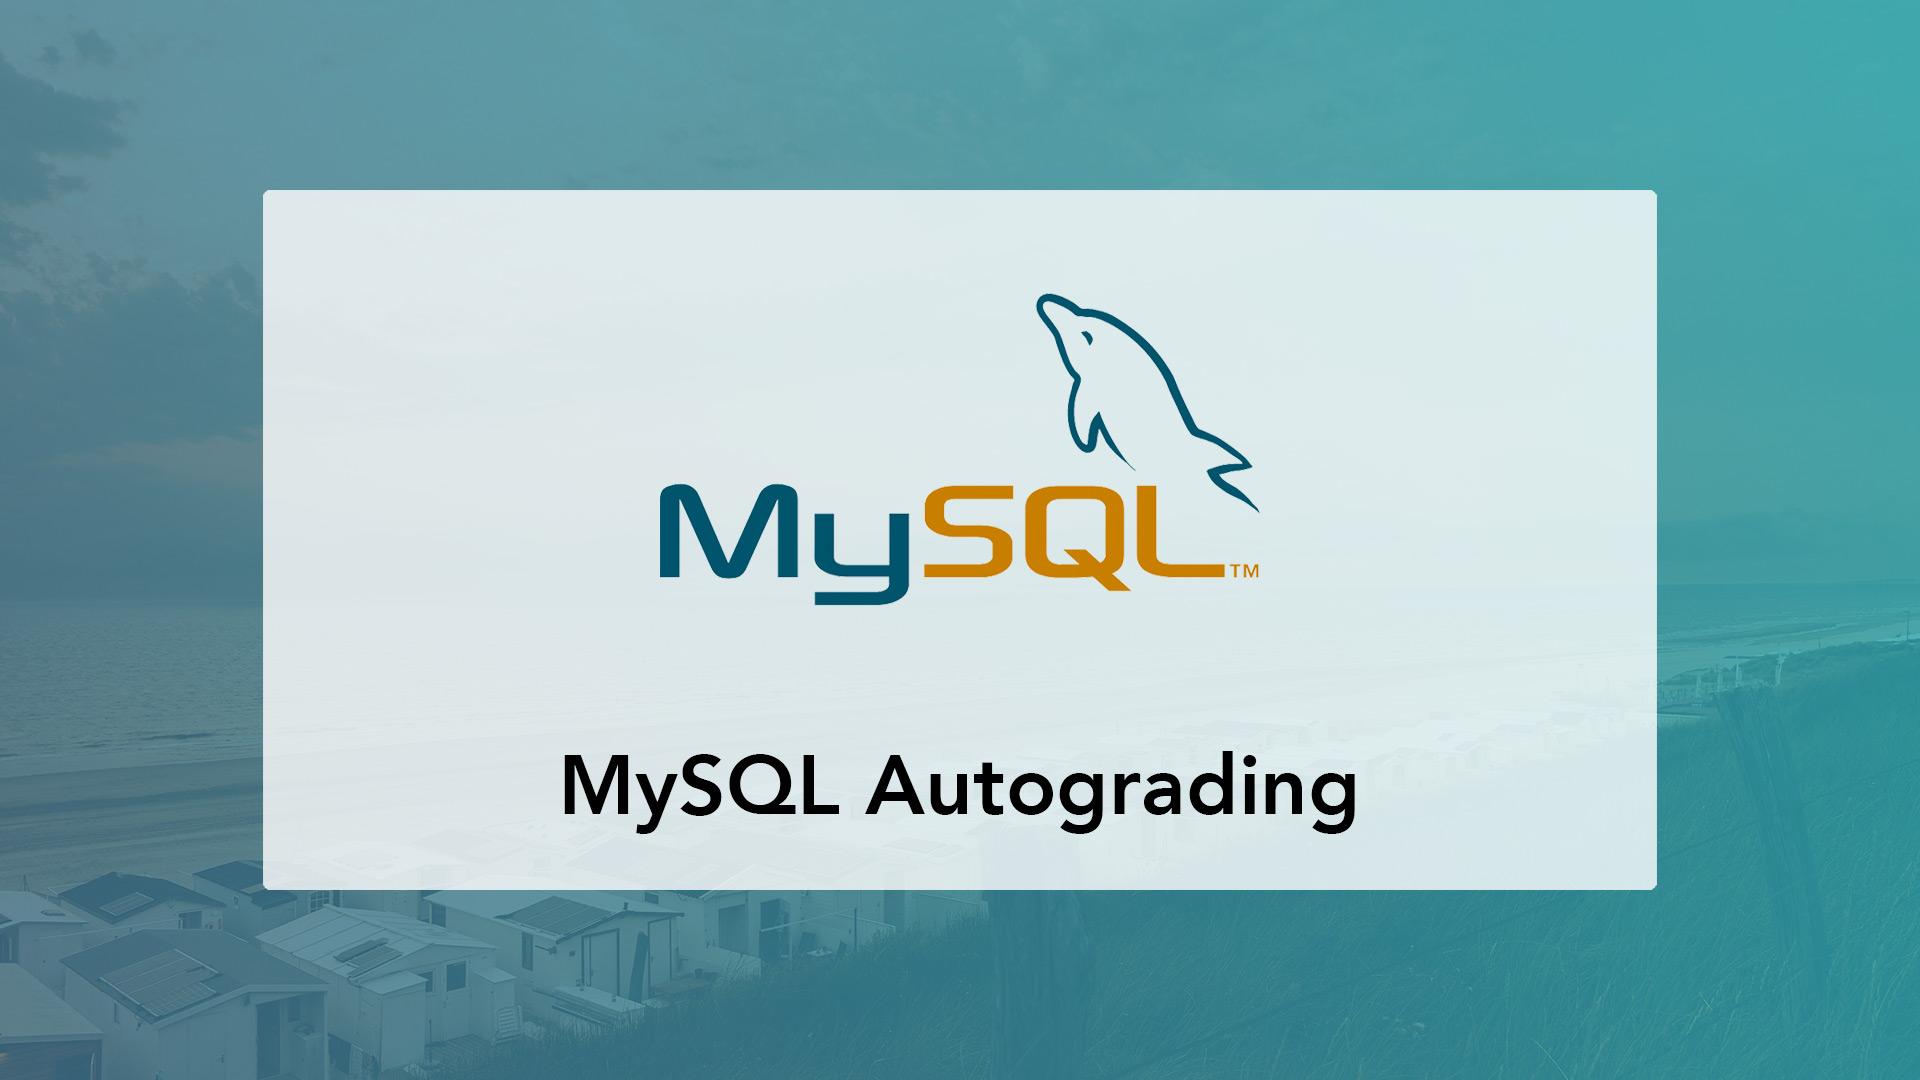 MySQL autograding for databases education